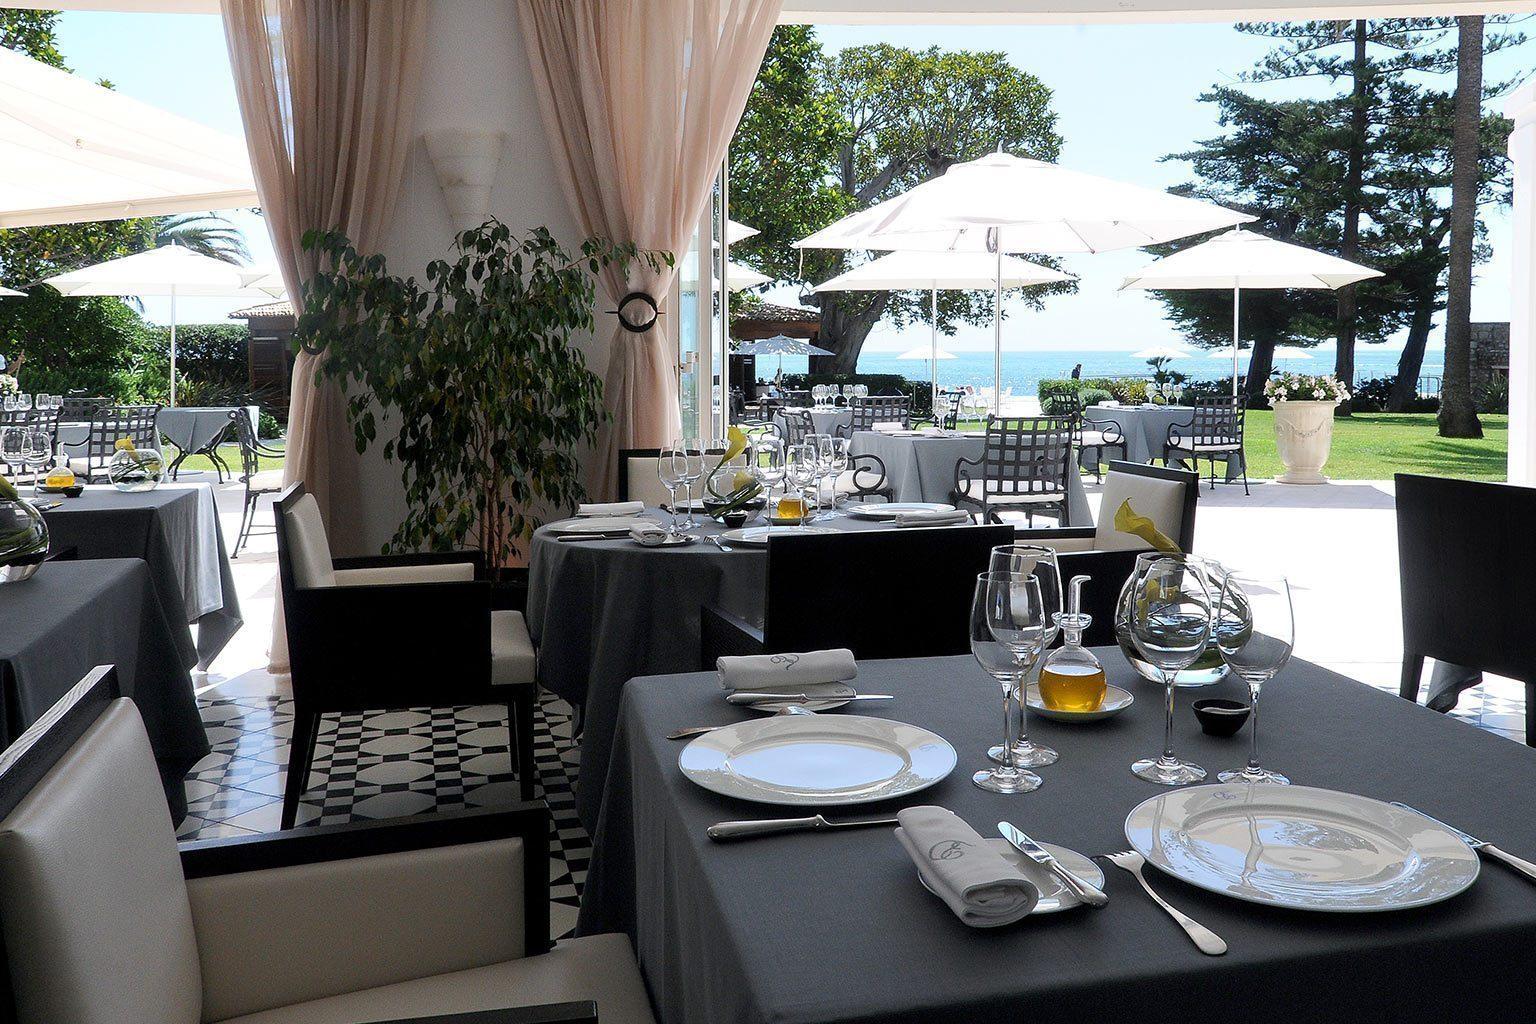 Cap estel in nizza luxushotels bei designreisen